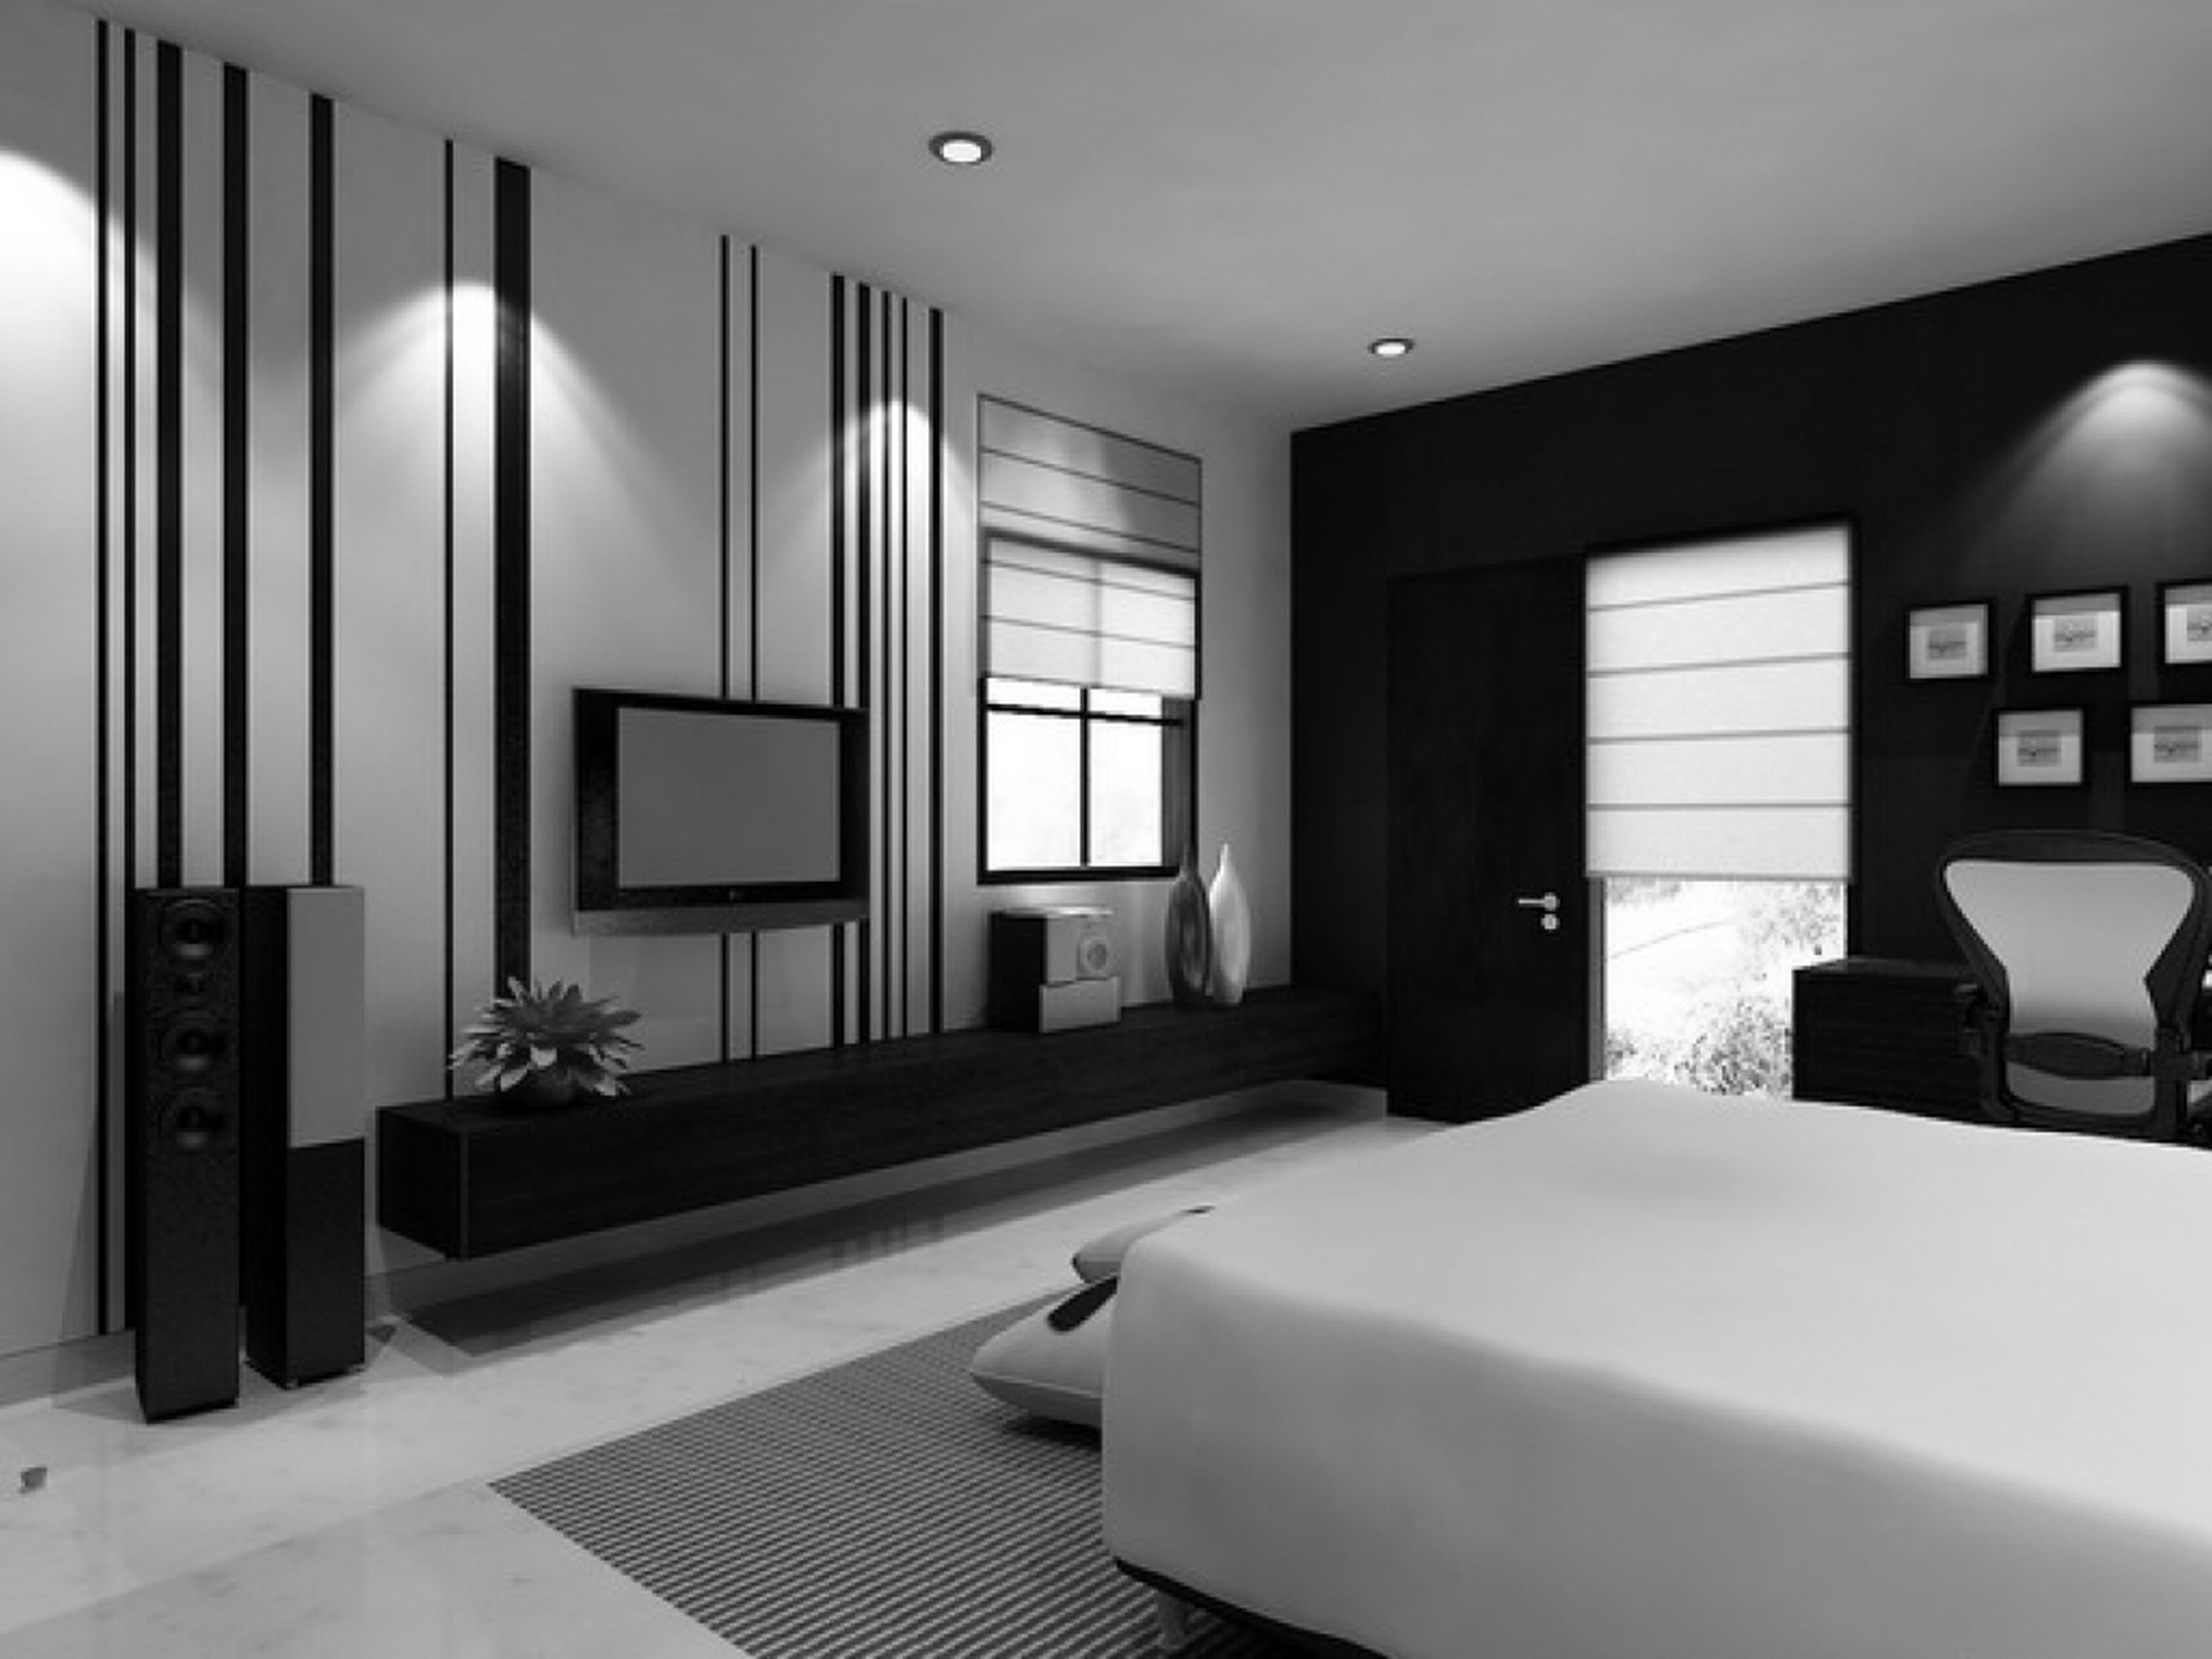 House Design Contemporary Black And White Interior Design For